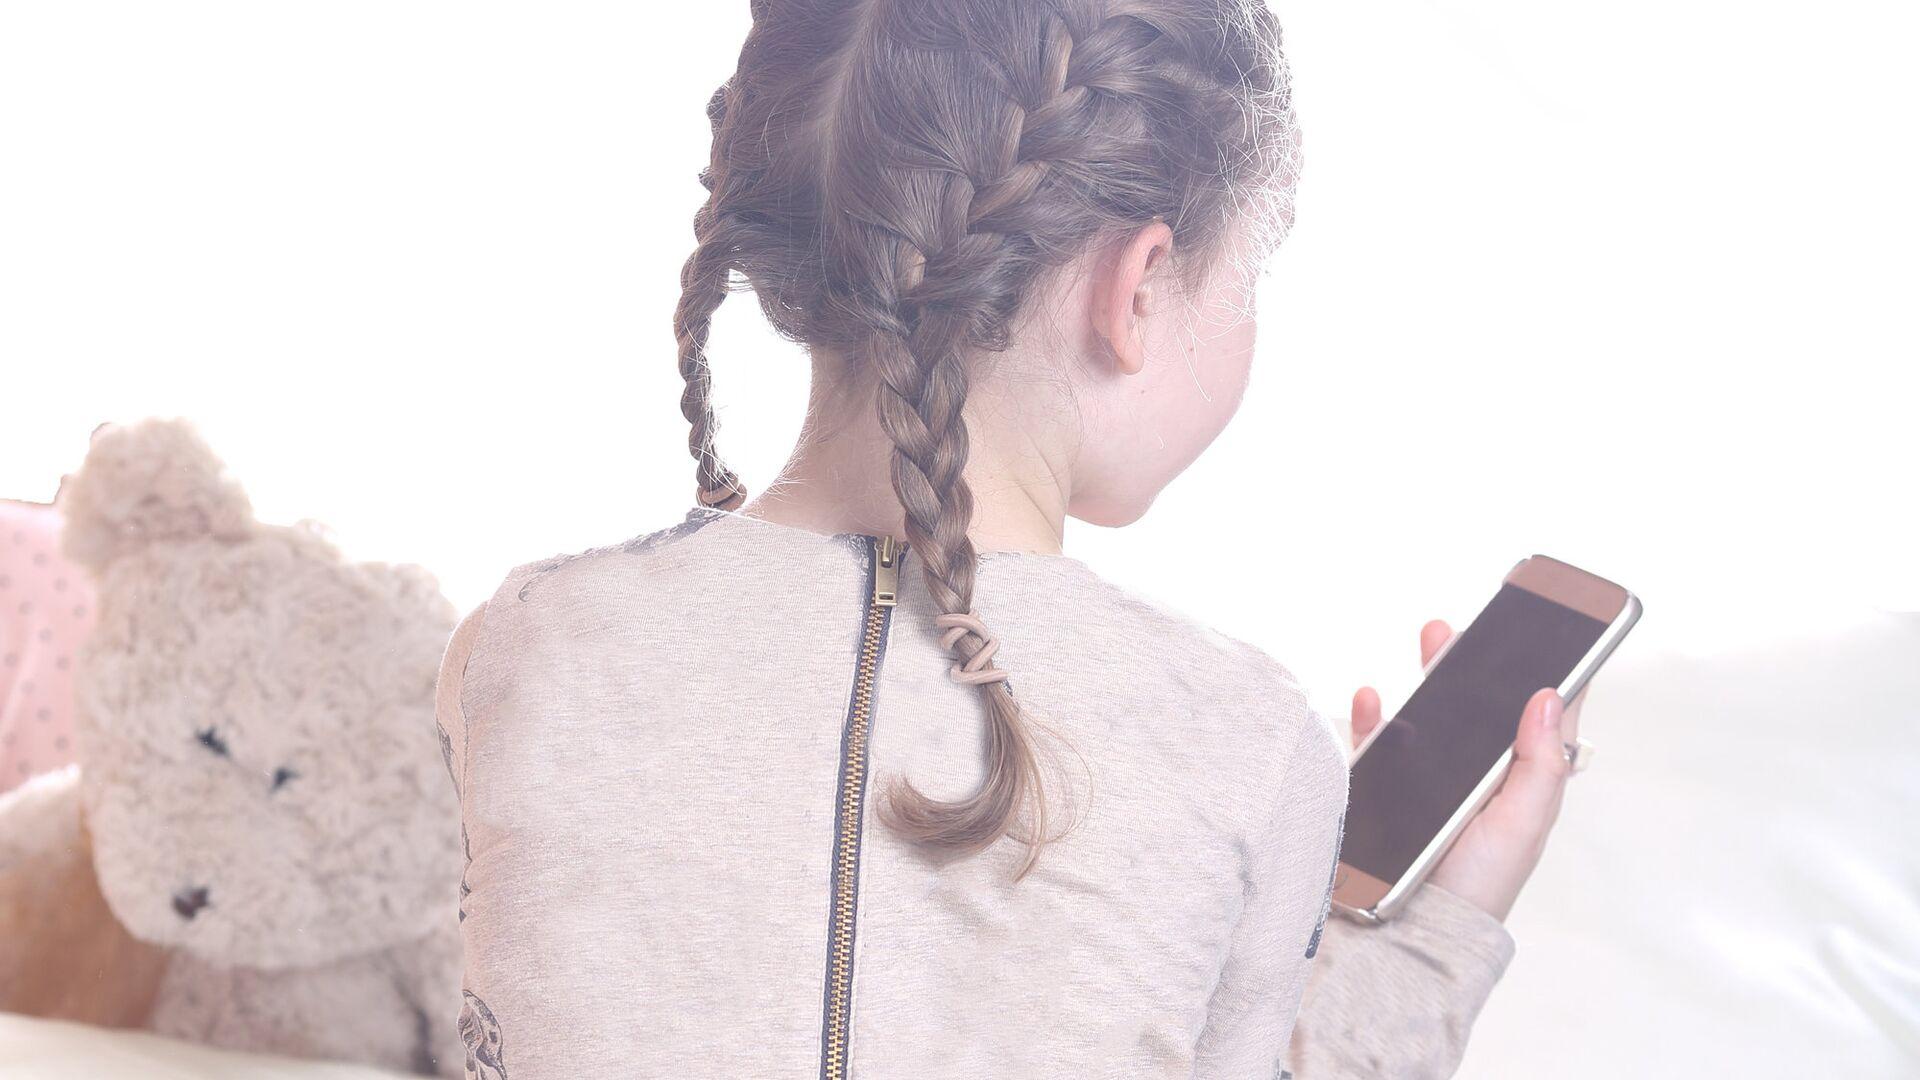 Ребенок со смартфоном  - РИА Новости, 1920, 02.03.2021